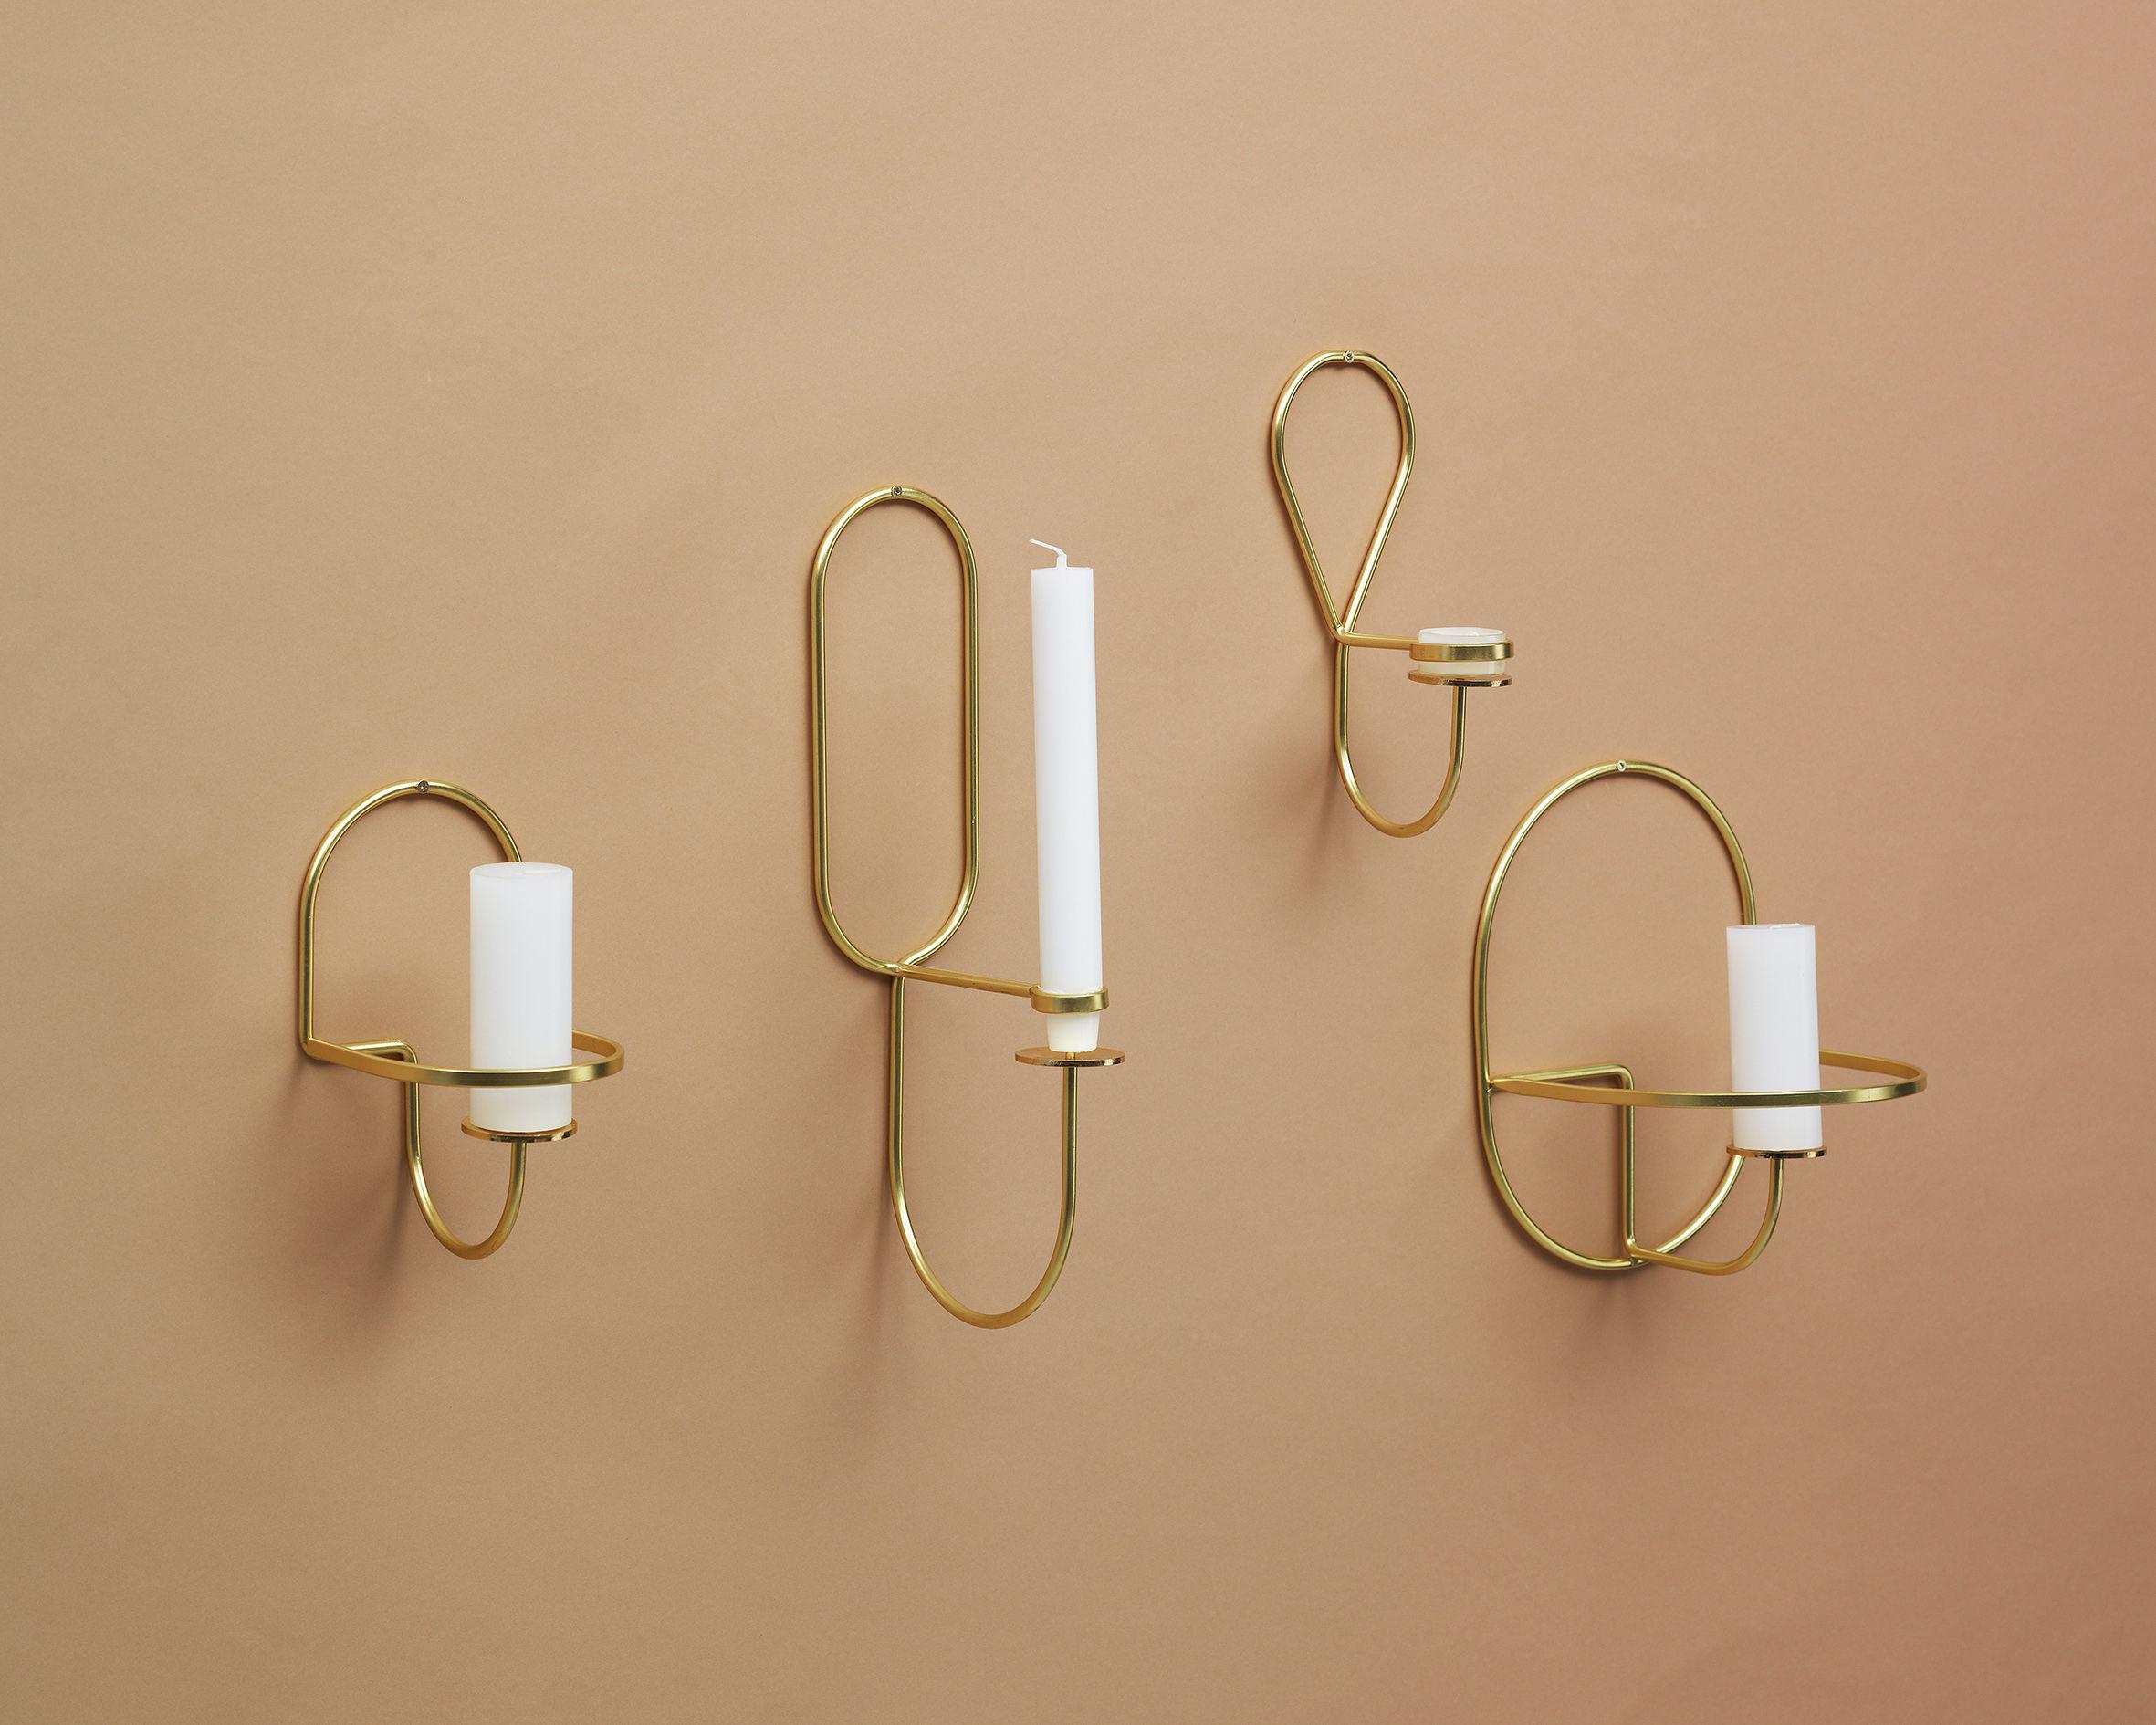 lup wall oblong wandkerzenhalter h 35 cm hay wand kerzenhalter. Black Bedroom Furniture Sets. Home Design Ideas